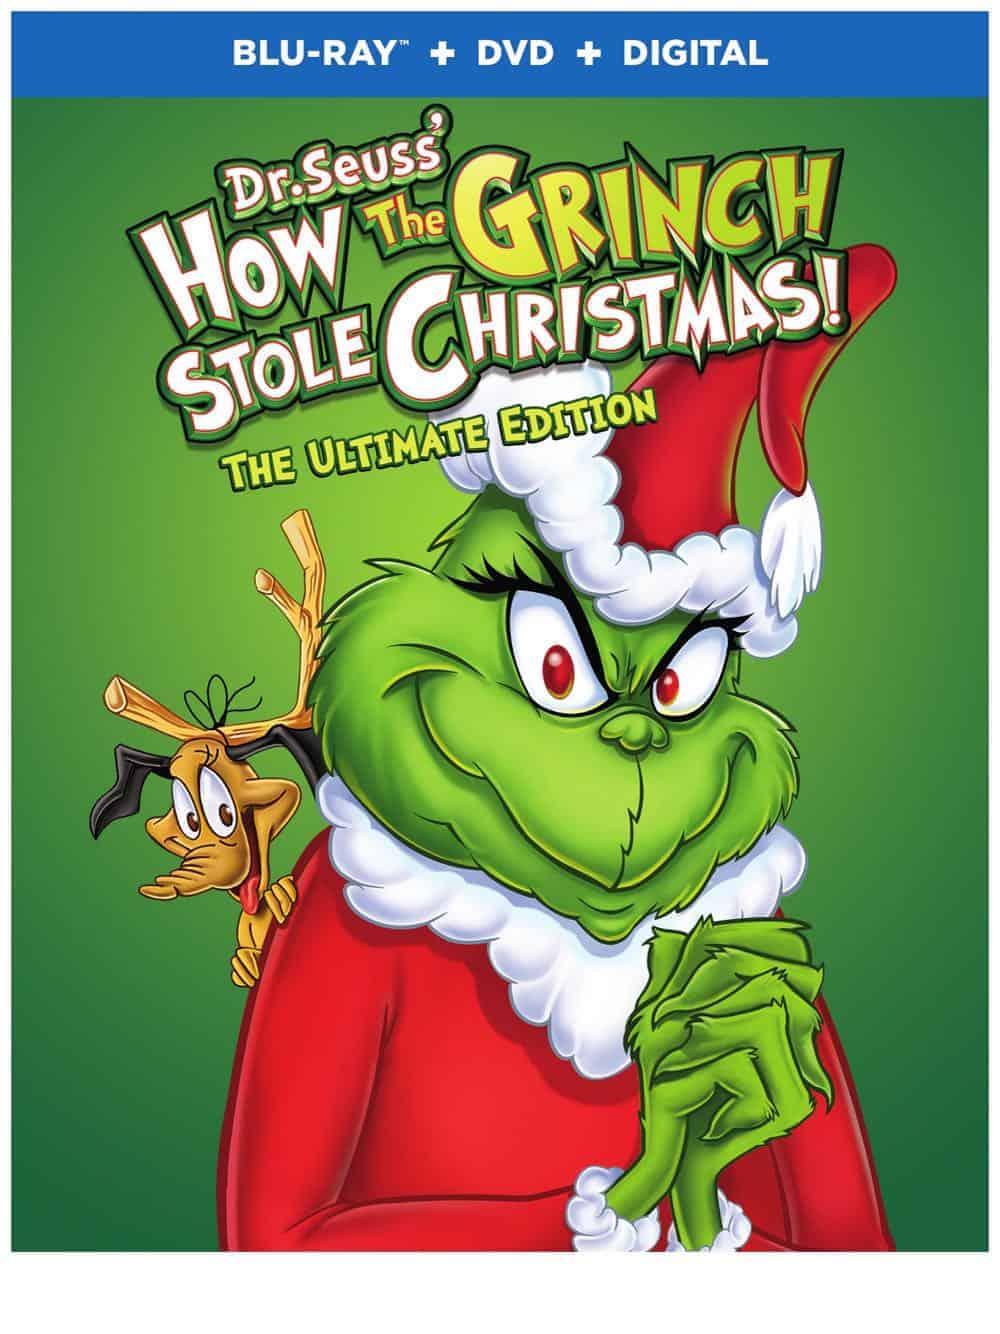 How the Grinch Stole Christmas UE Flat Box Art